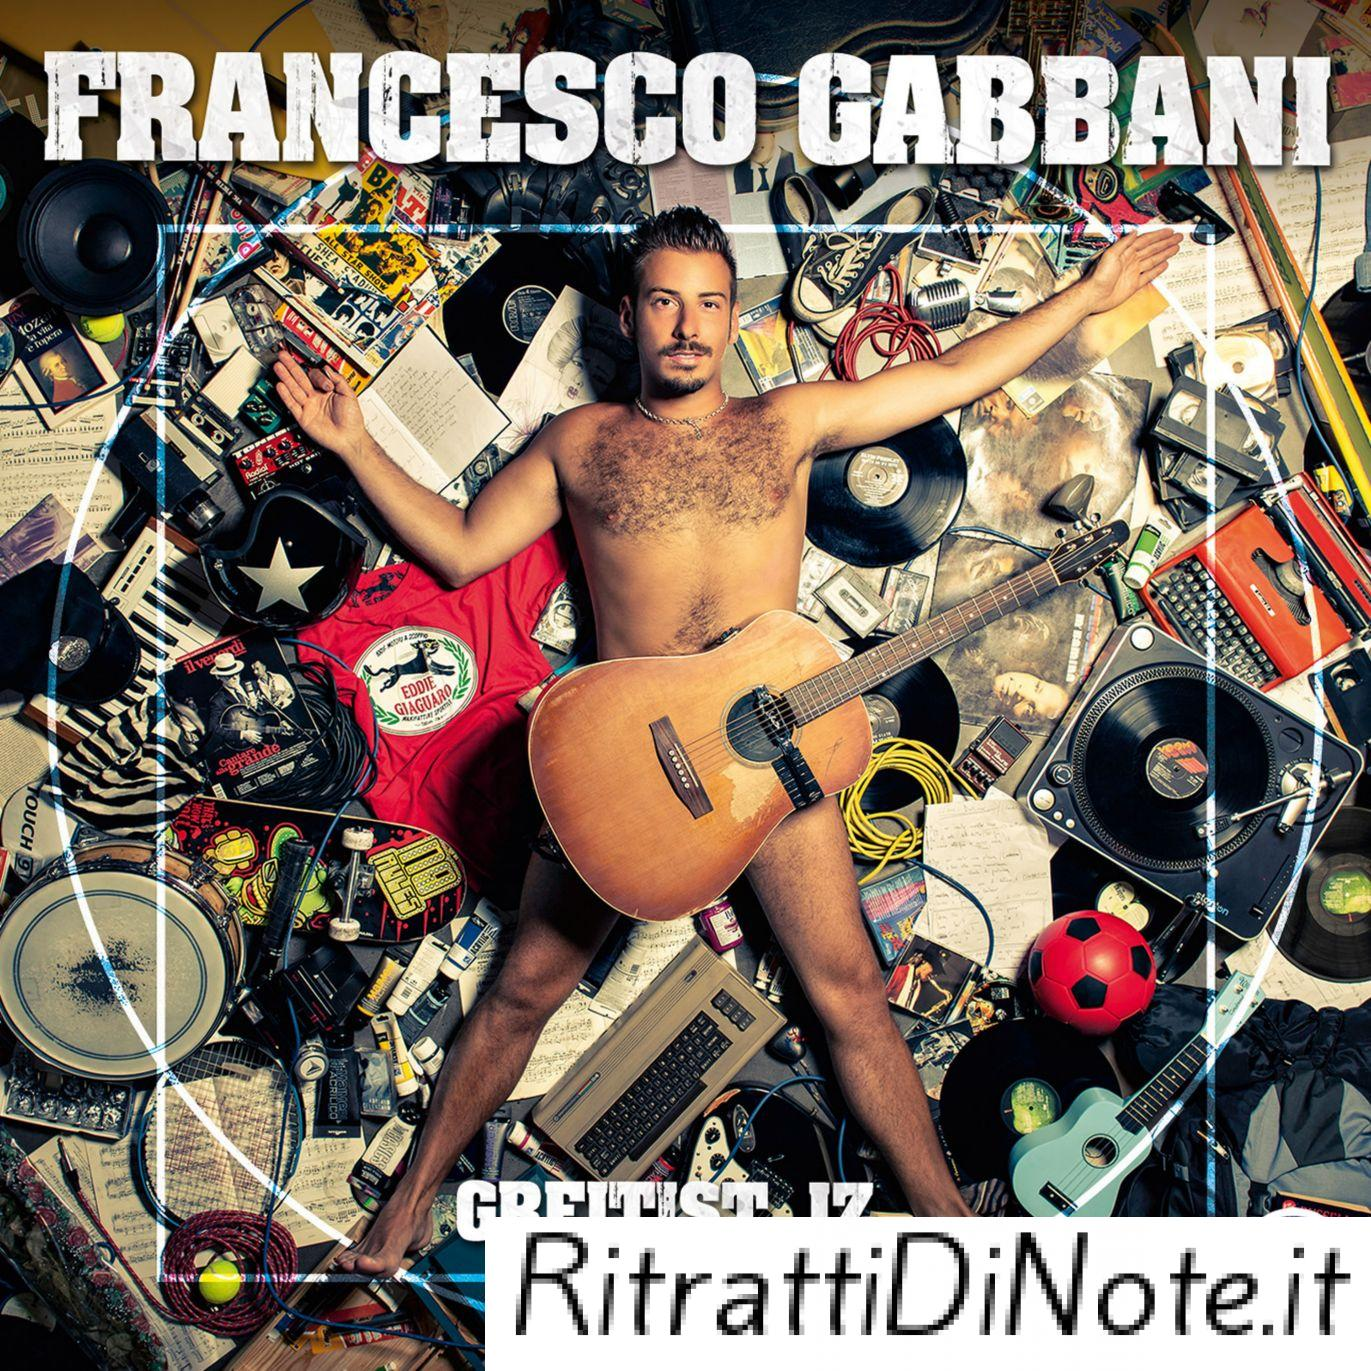 francesco_gabbani_-_i_dischi_non_si_suonano